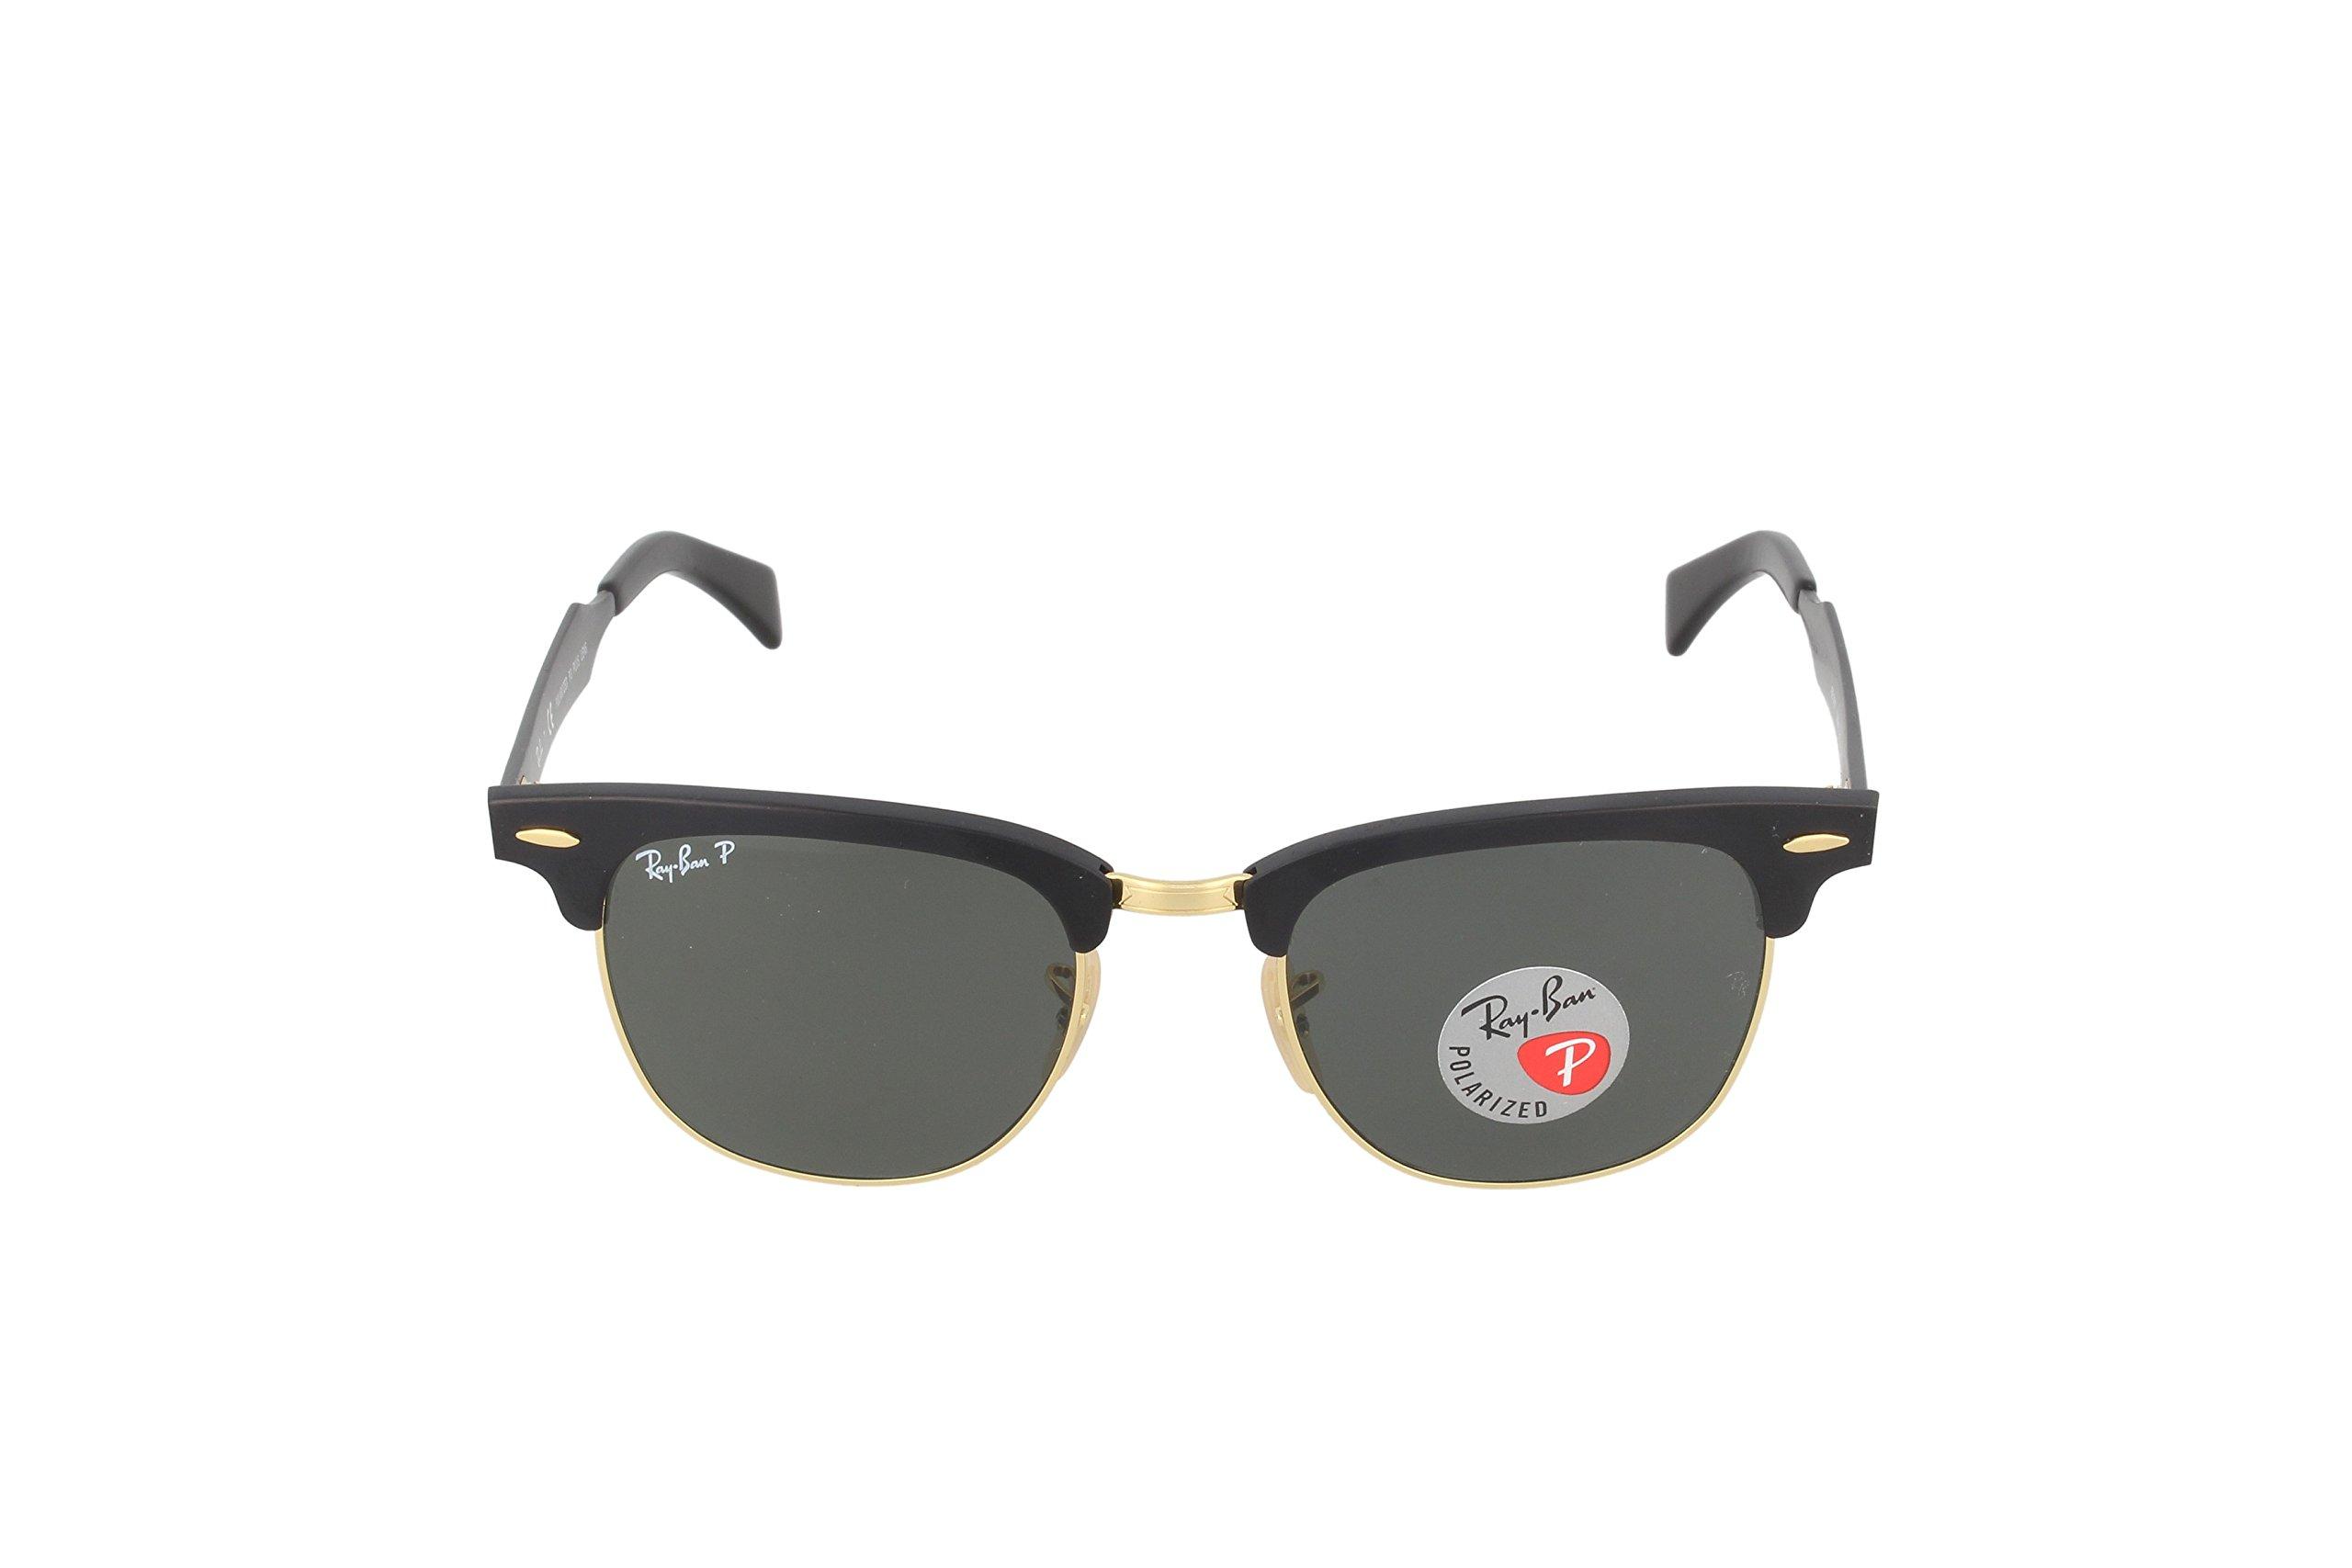 621a85db455fa Buyr.com - Ray-Ban RB3507 136 N5 Clubmaster Aluminum Polarized Sunglasses